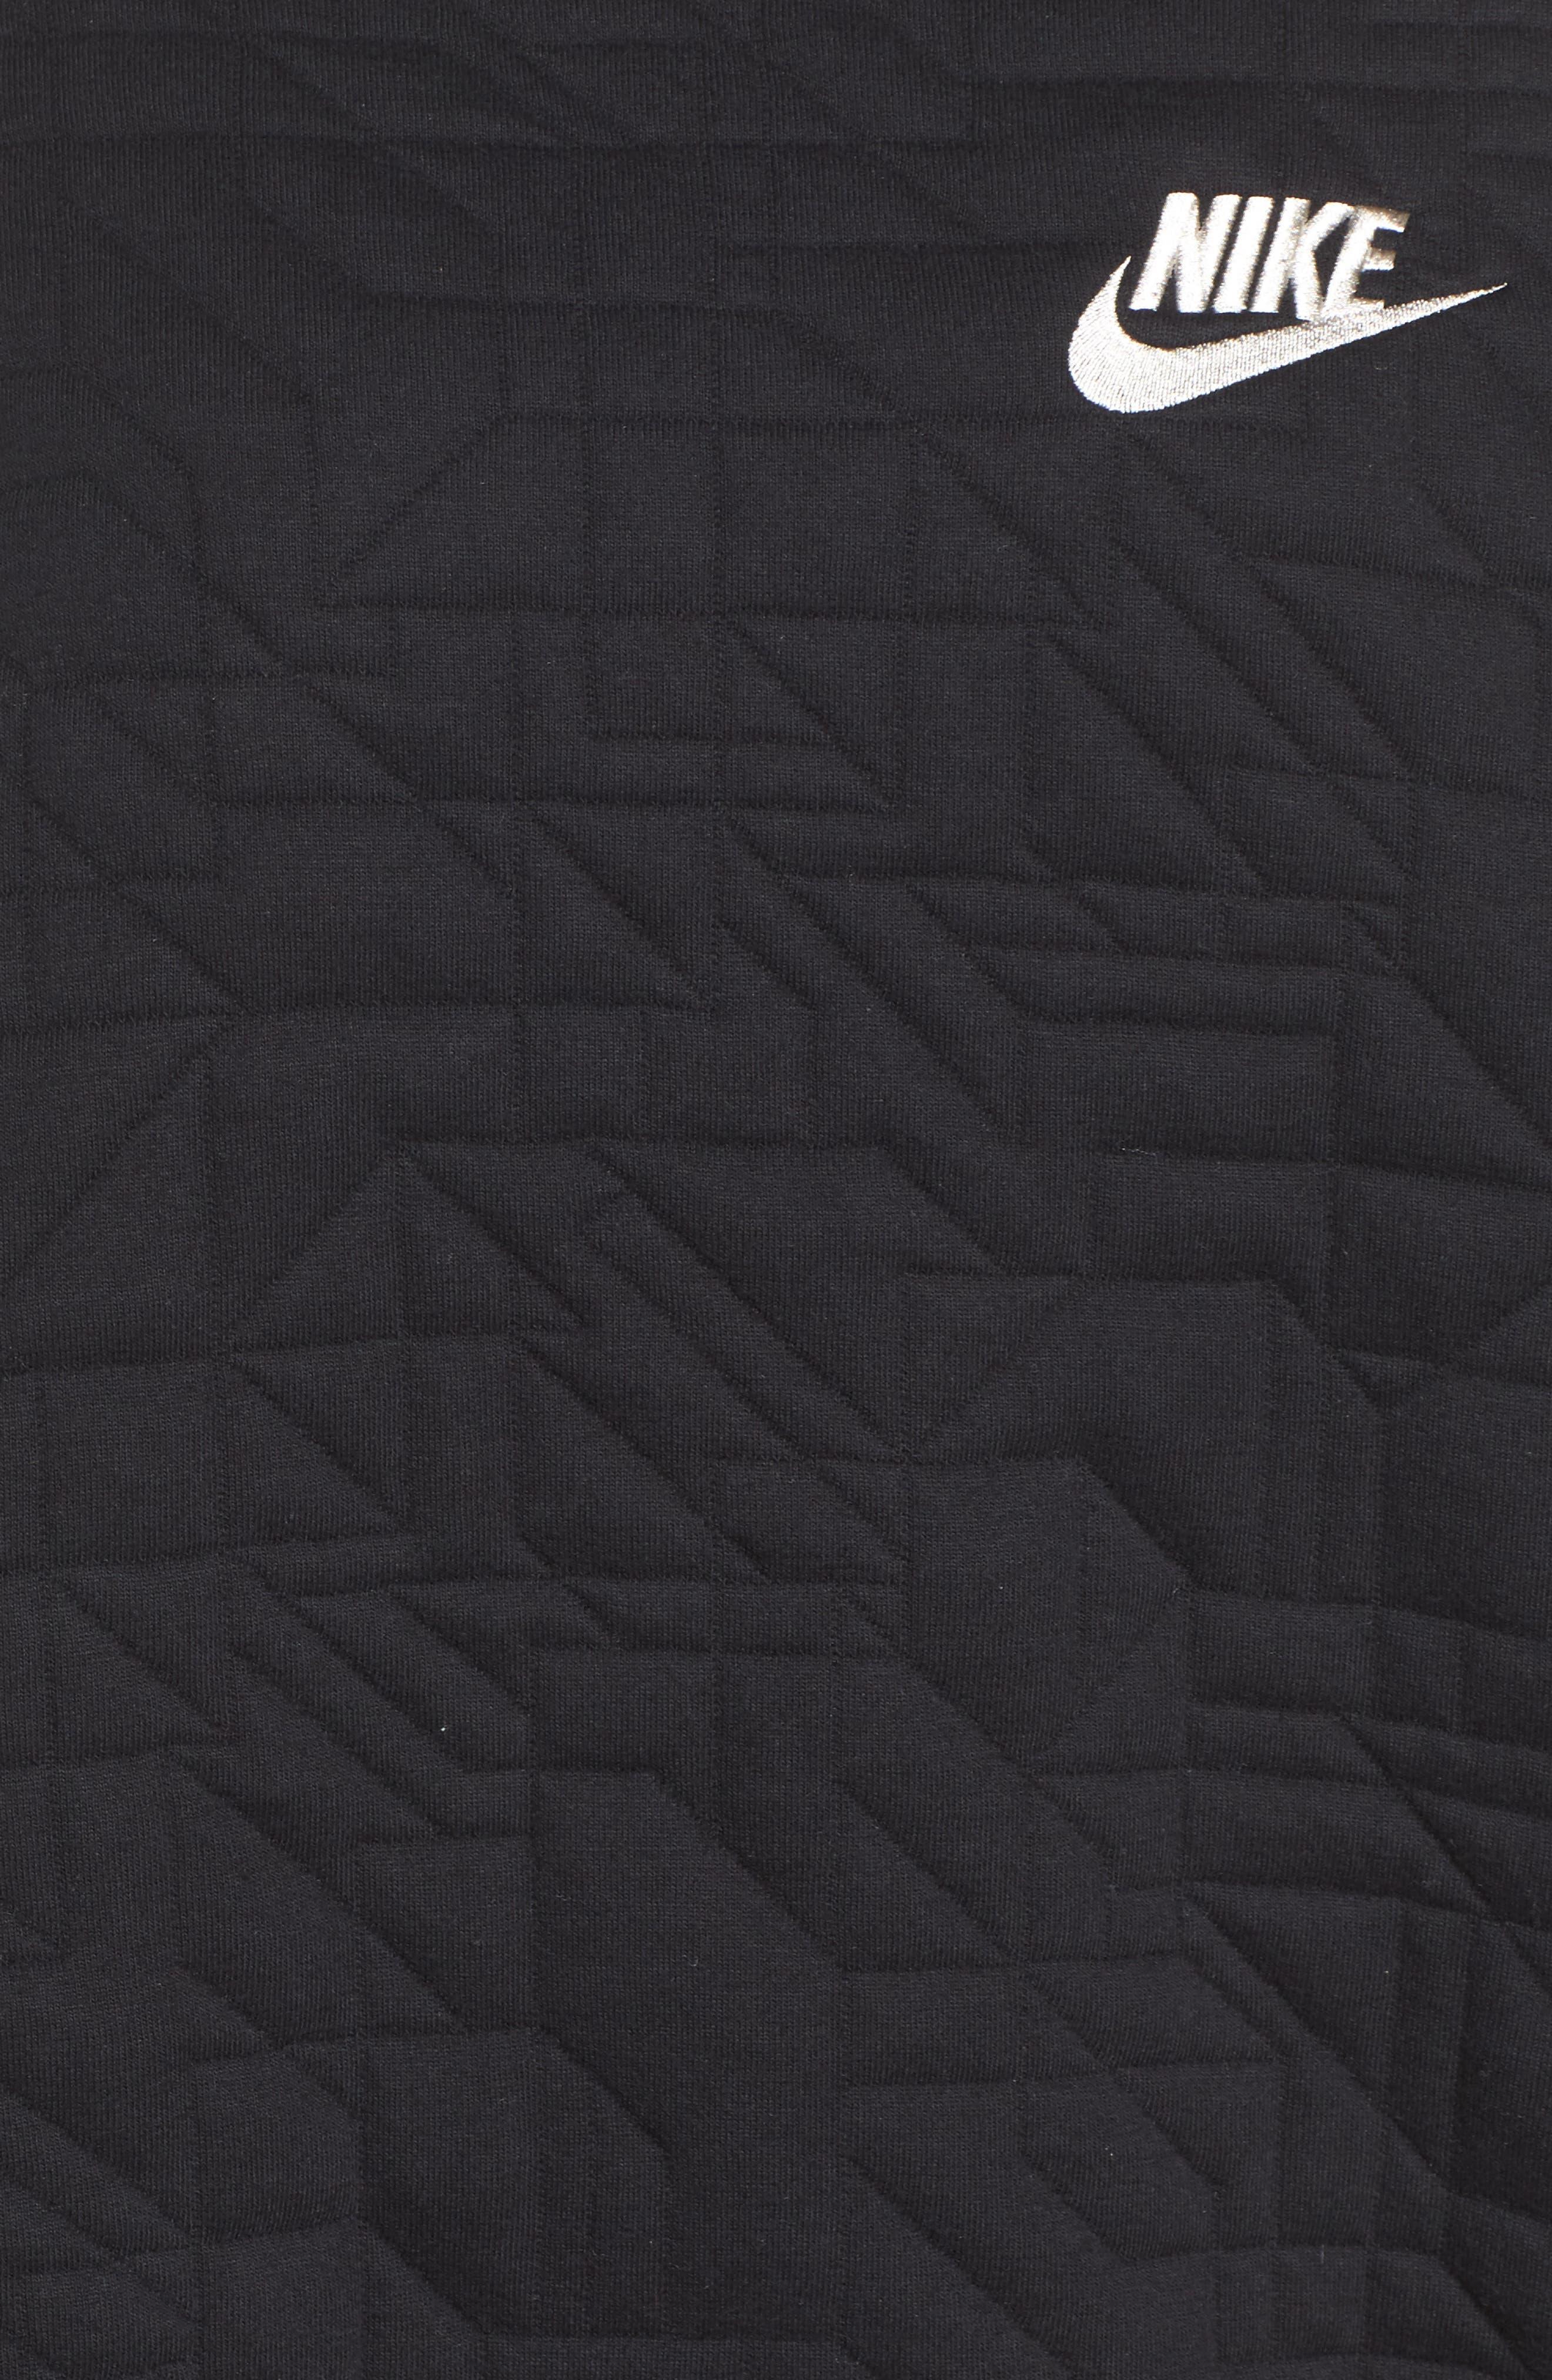 Sportswear Quilted Funnel Neck Pullover,                             Alternate thumbnail 6, color,                             Black/ Light Bone